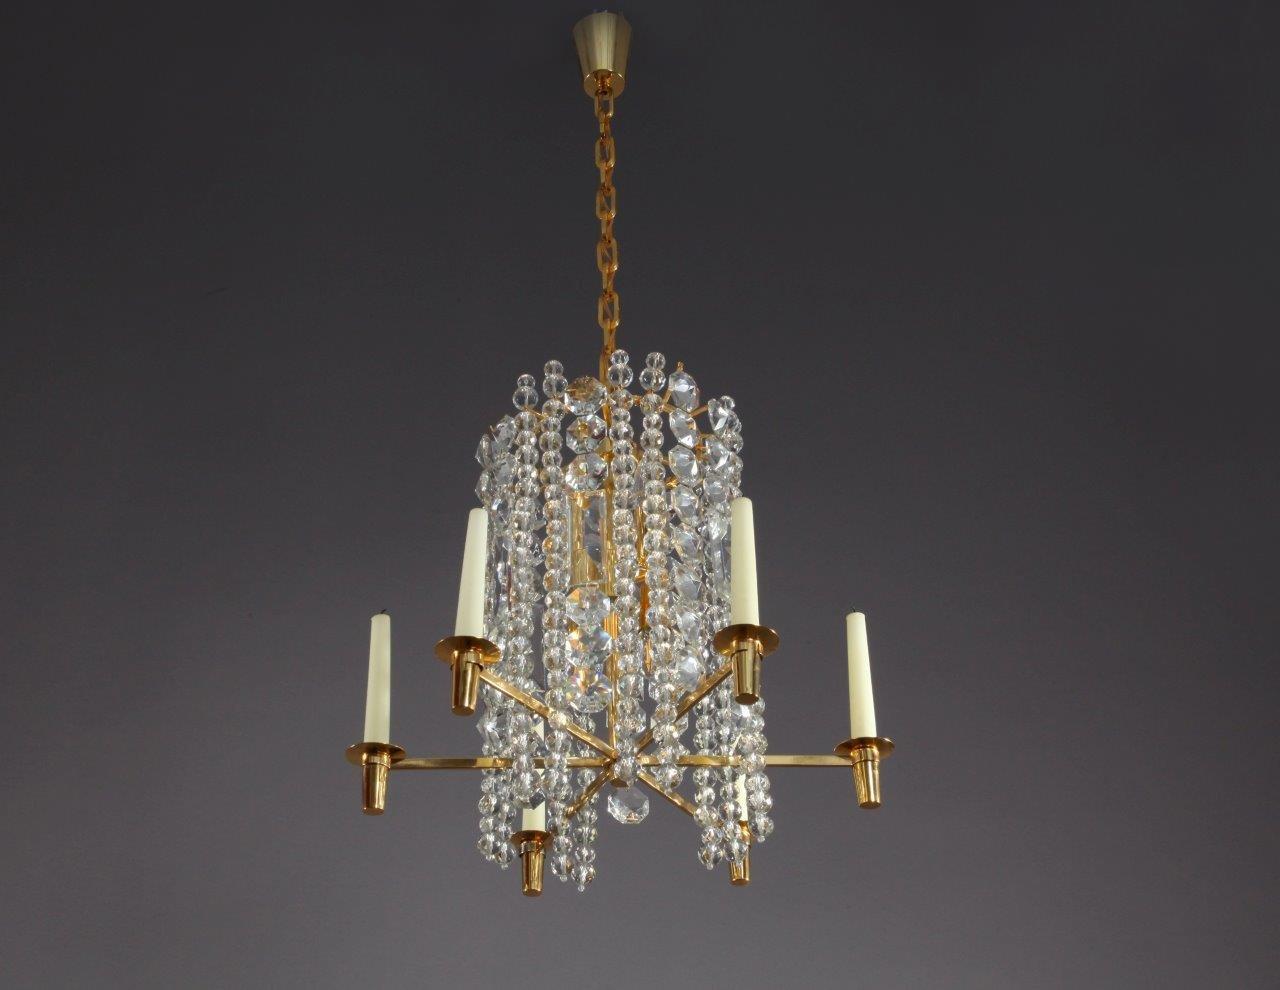 Austrian gilt brass crystal and glass chandelier pendant light from austrian gilt brass crystal and glass chandelier pendant light from bakalowits shne 1960s arubaitofo Choice Image